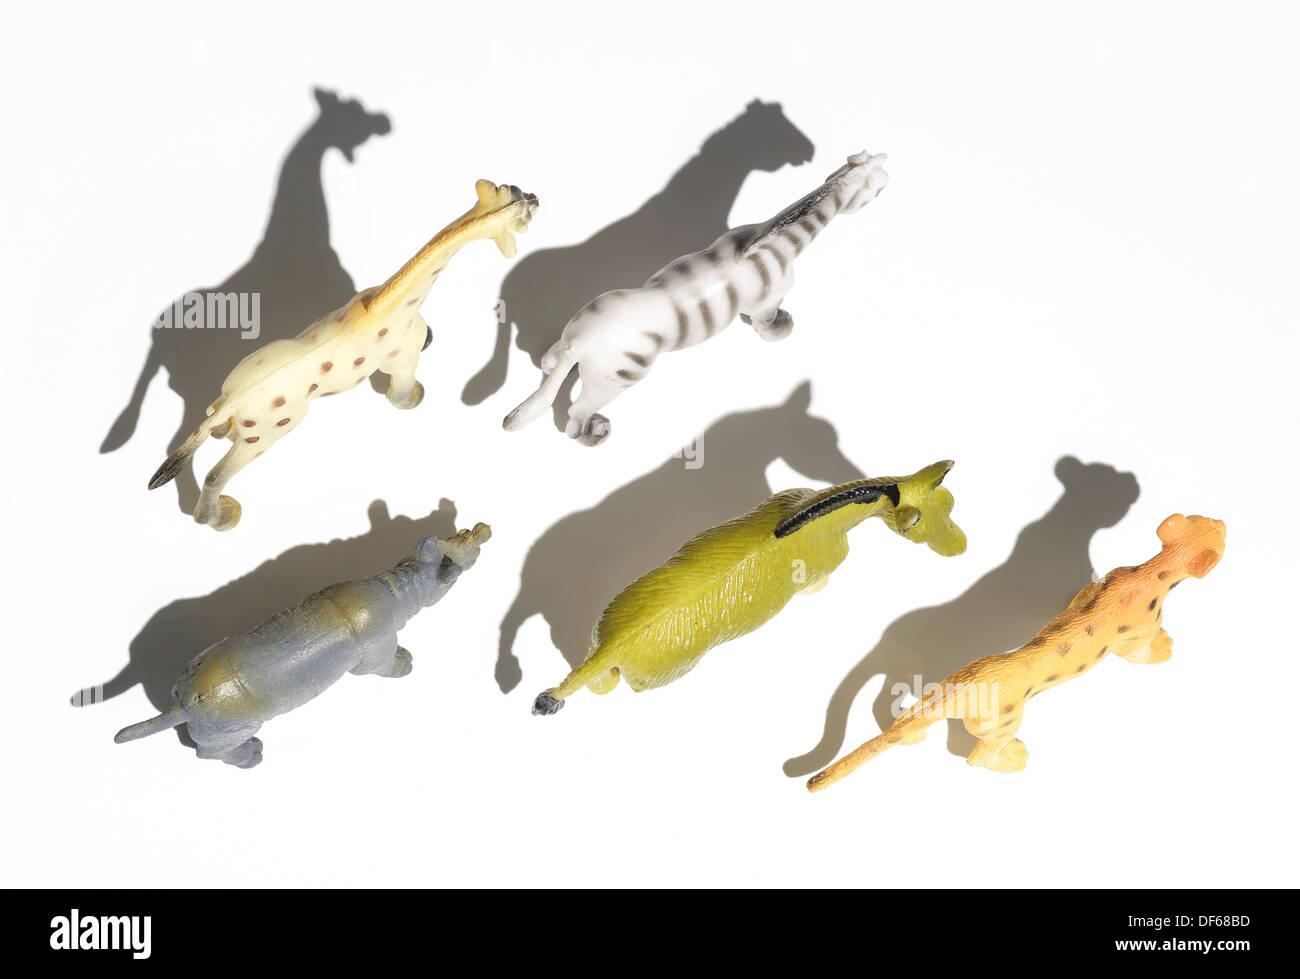 Sobrecarga de animales silvestres de juguete de plástico Imagen De Stock